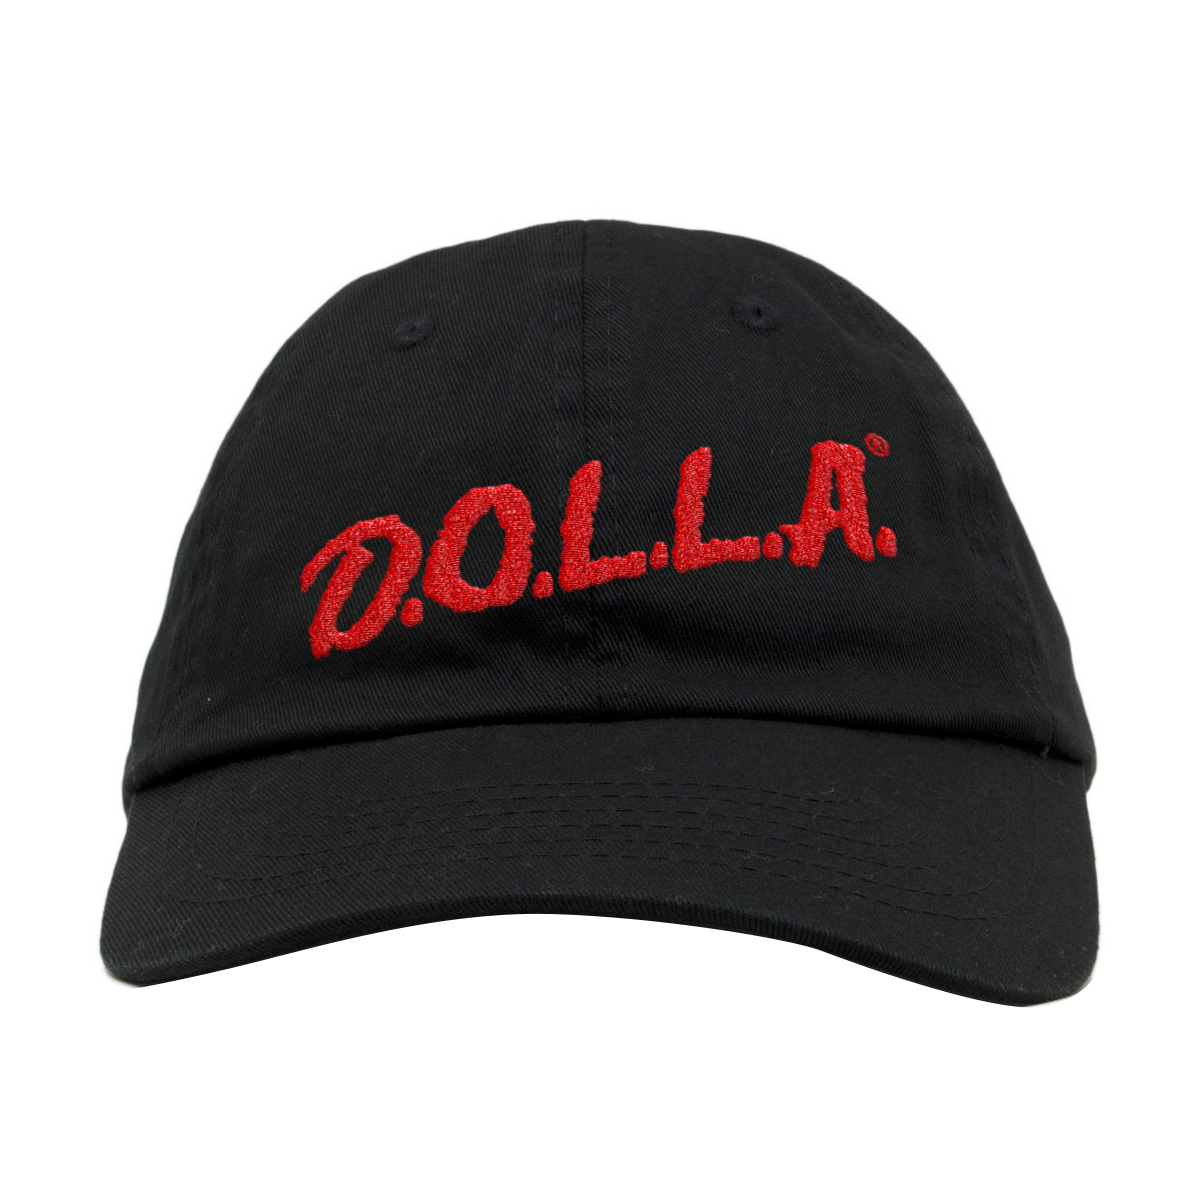 D.O.L.L.A. Dad Hat & BIG D.O.L.L.A. Deluxe Digital Download